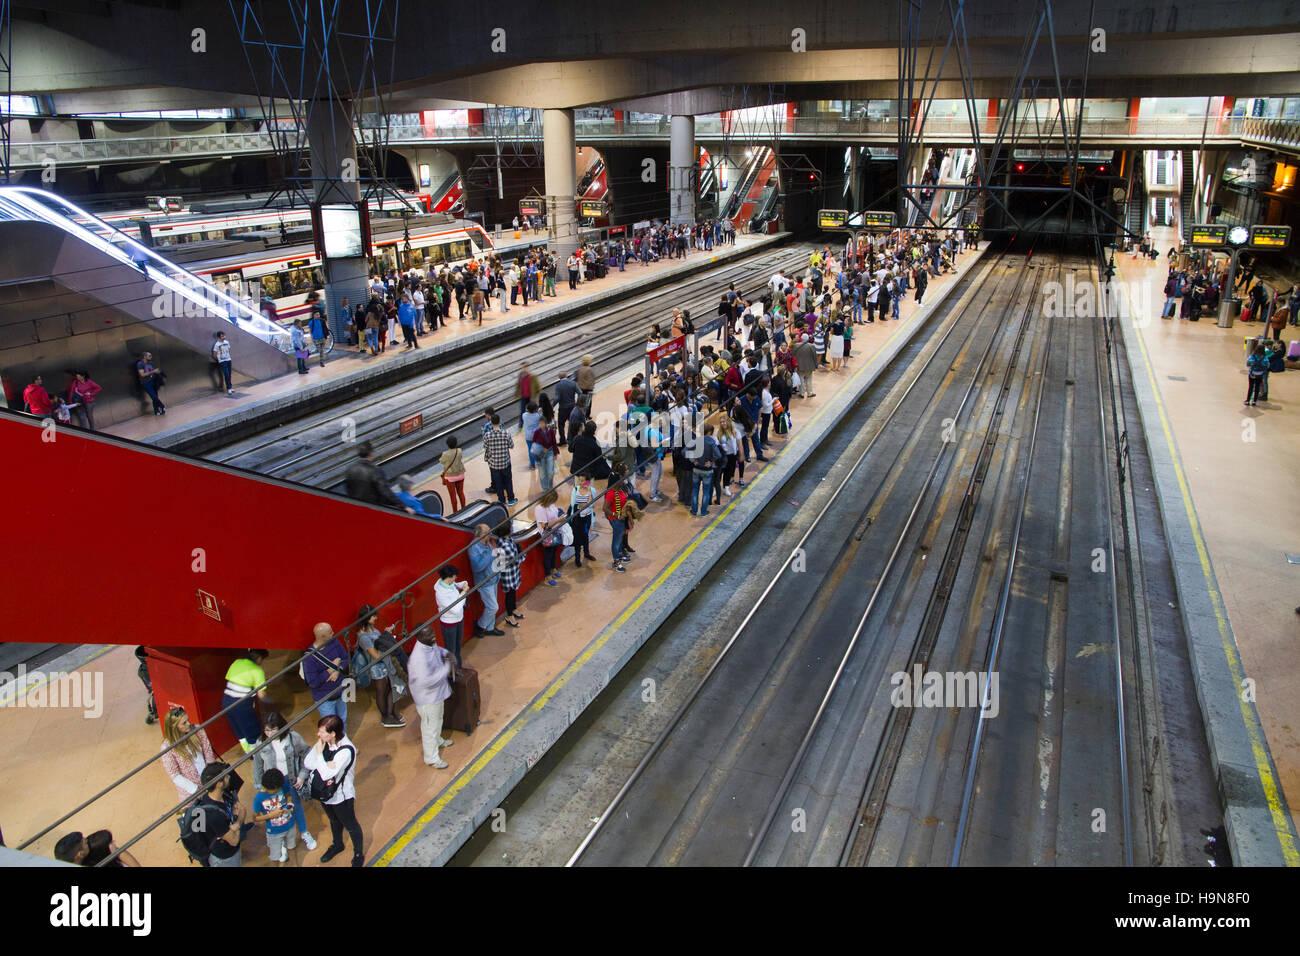 Madrid Spain Atocha railway station interior people waiting - Stock Image